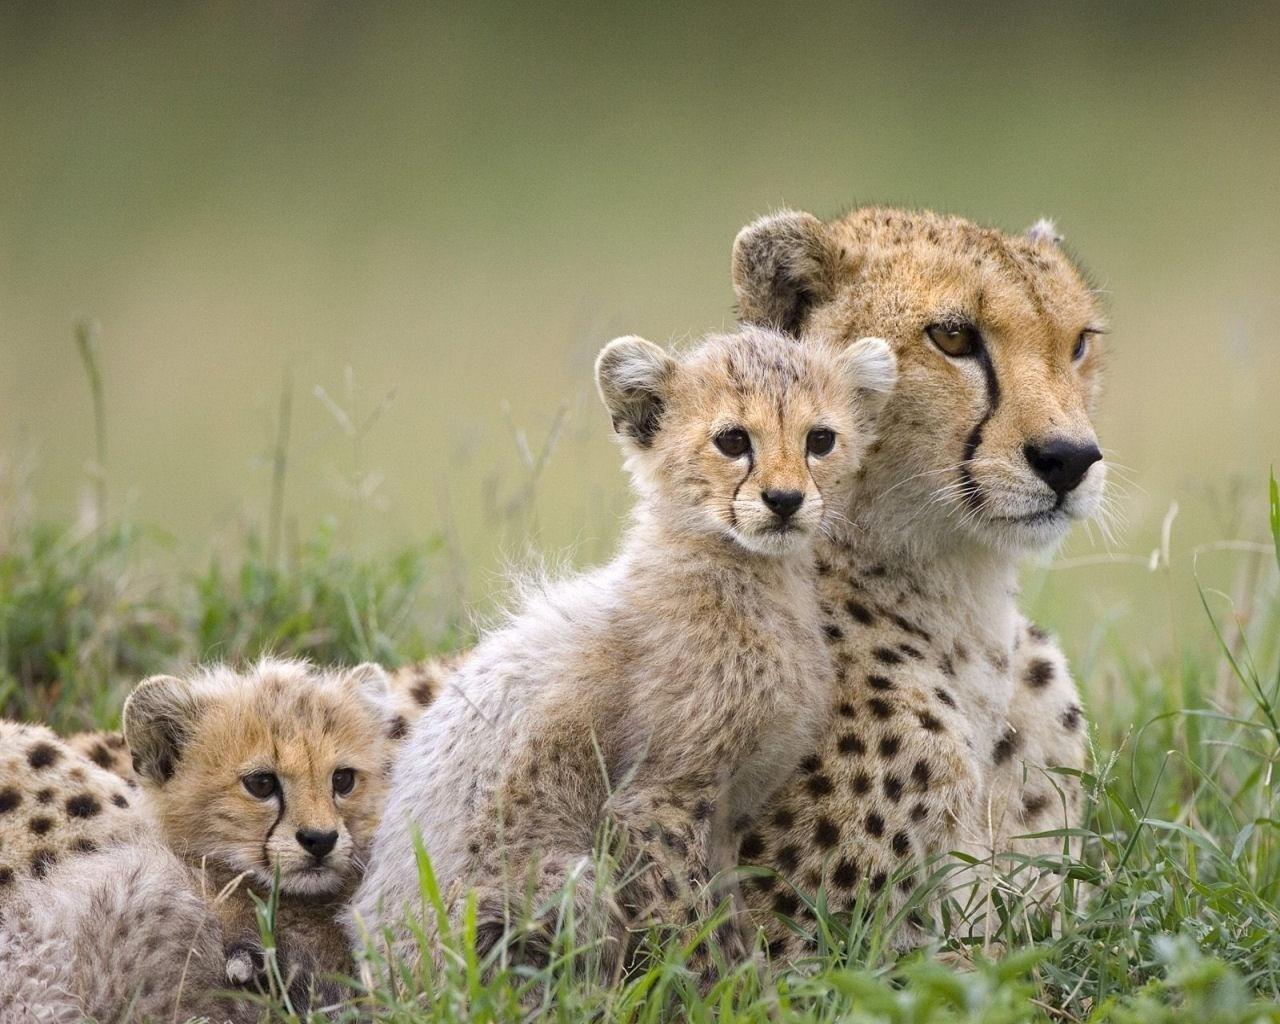 http://2.bp.blogspot.com/-OVrM1WZjp3k/Tj20l1OHCRI/AAAAAAAARV0/eDTJkhhii-E/s1600/animals+in+the+wild-3.jpg